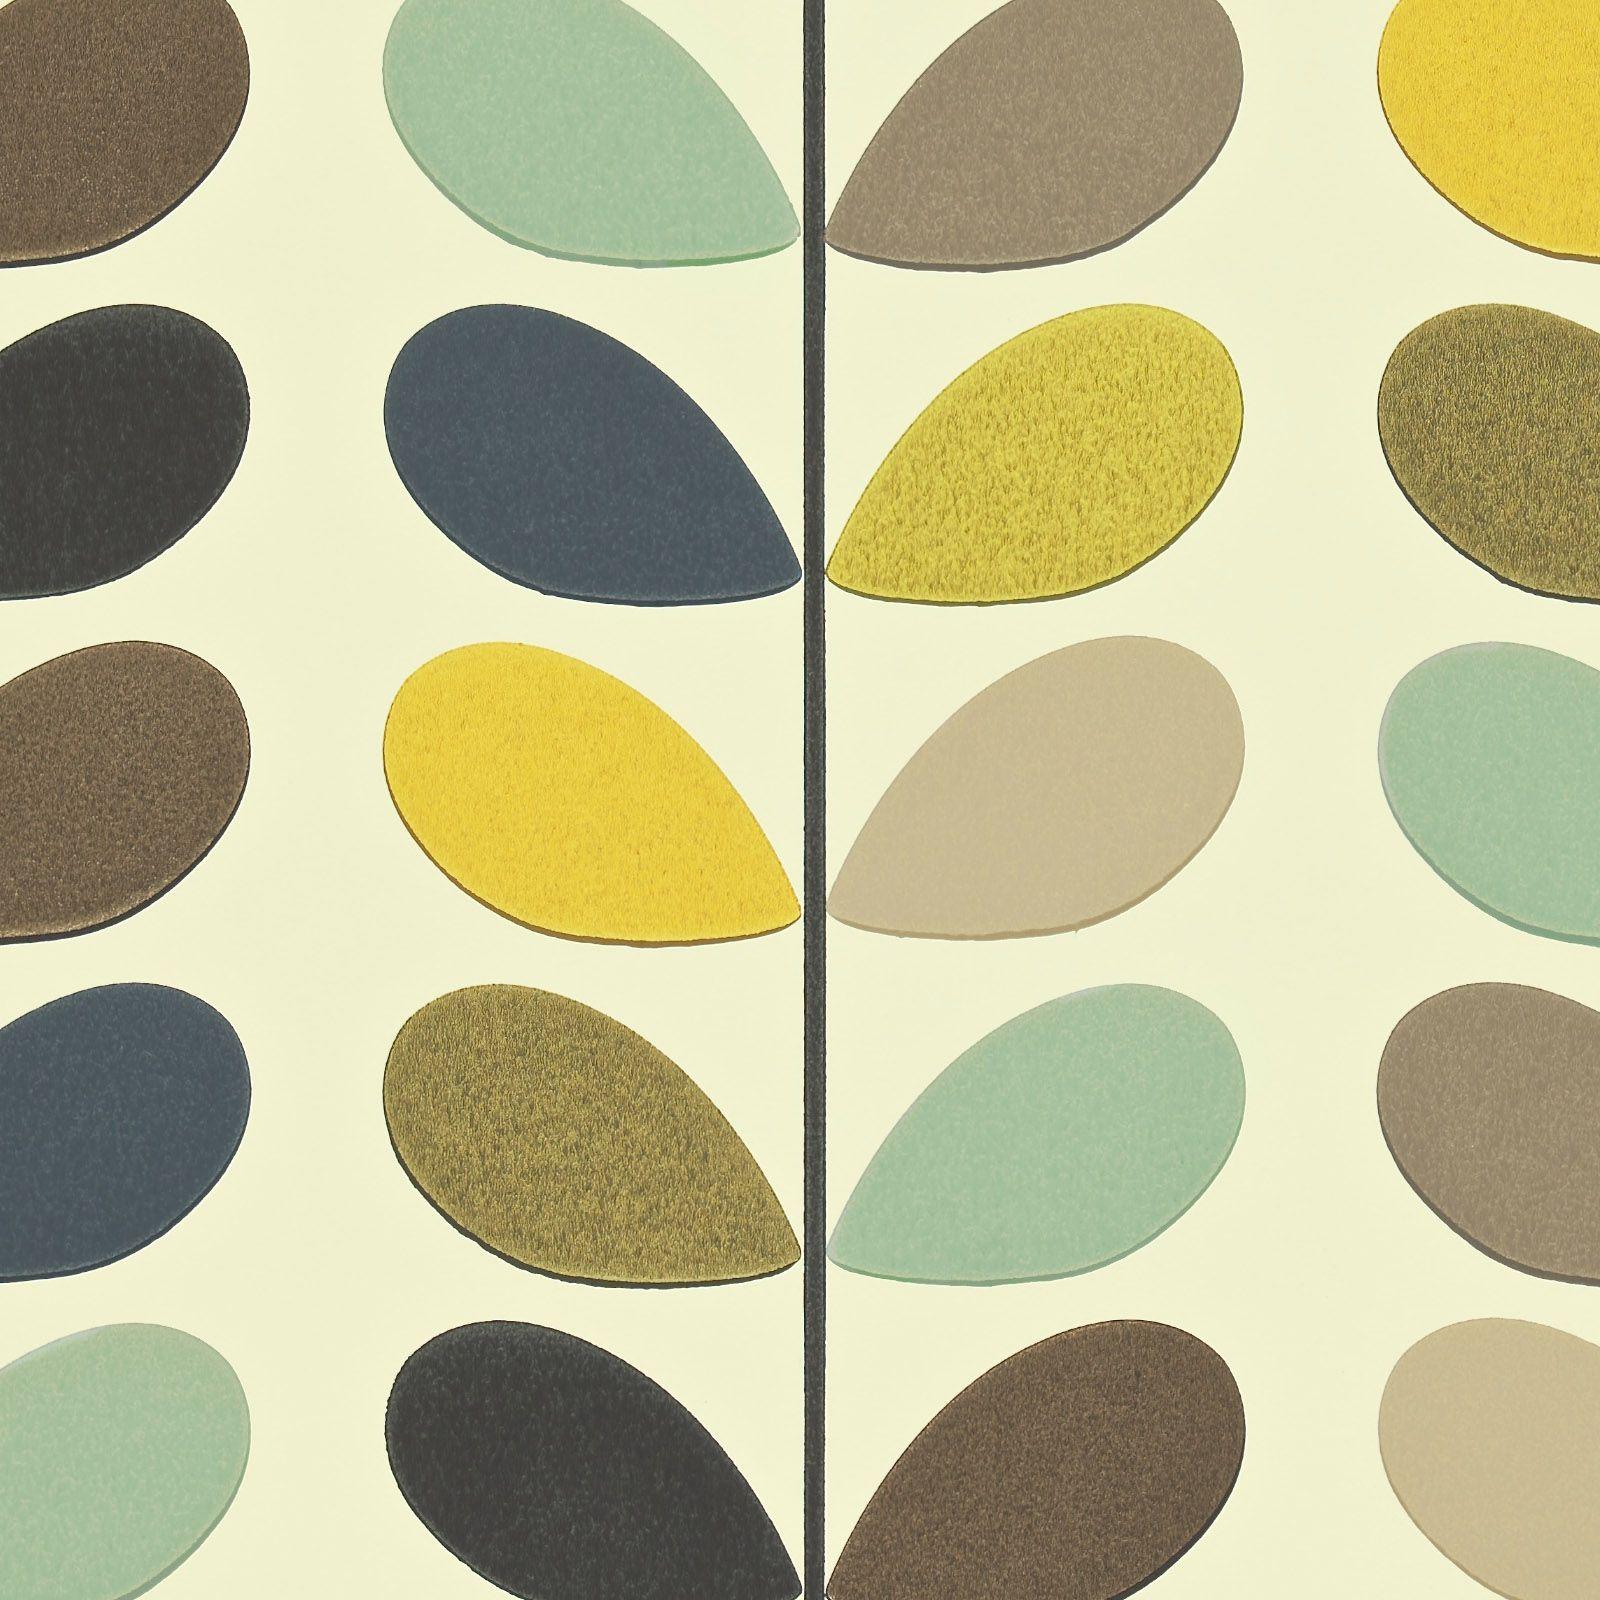 Orla kiely linear stem wallpaper - Orla Kiely Orla Kiely Multi Stem Print Wallpaper Now Available In Two Colourways